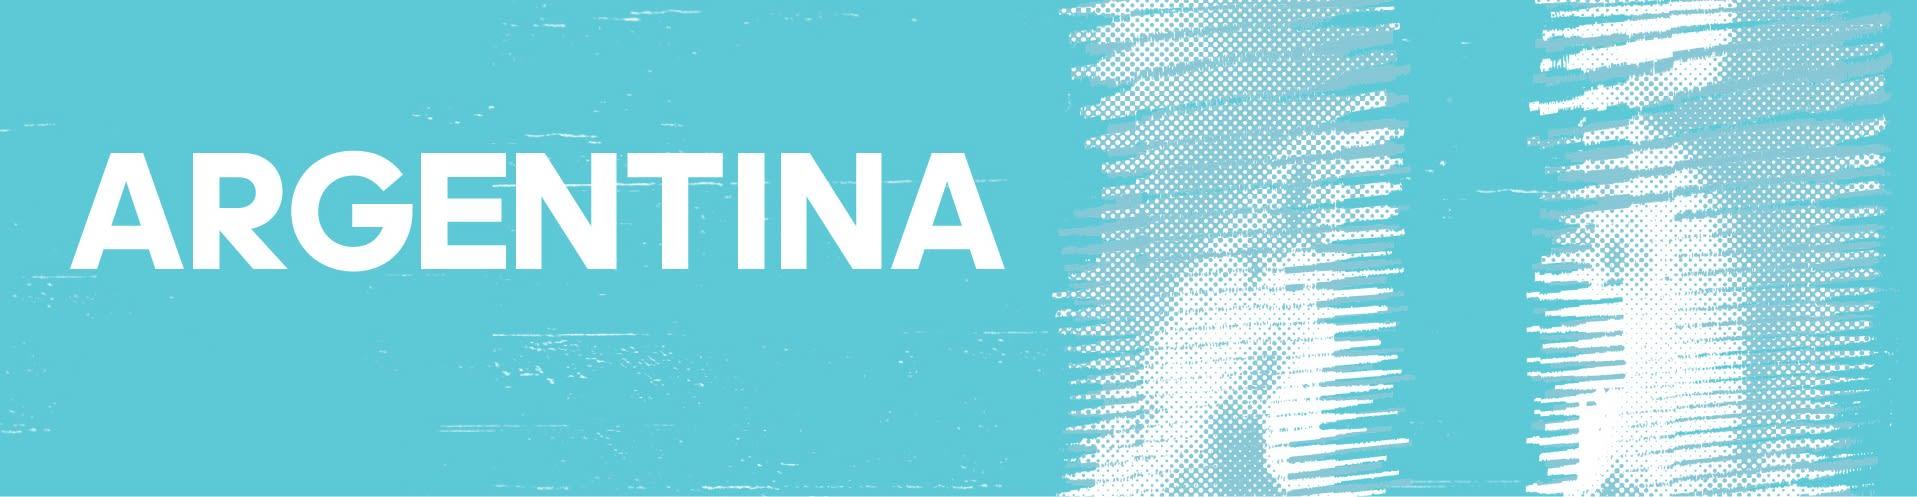 Argentina National Team 2018 FIFA World Cup™ | adidas UK